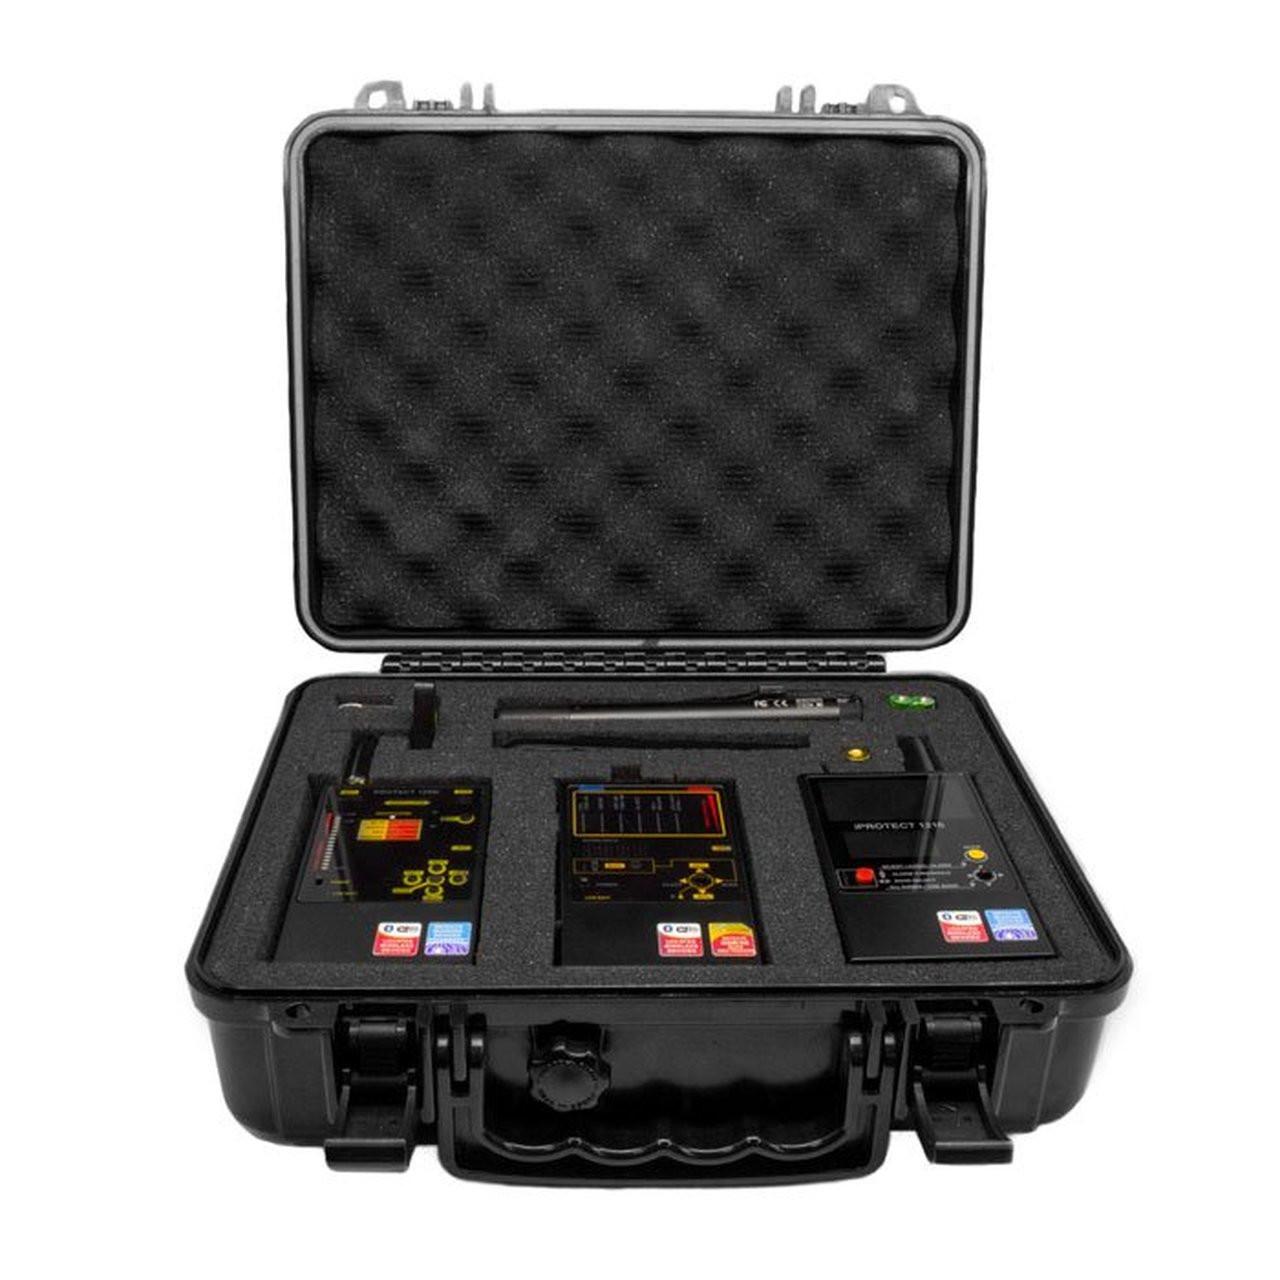 Law Enforcement Grade RF Detectors set in case